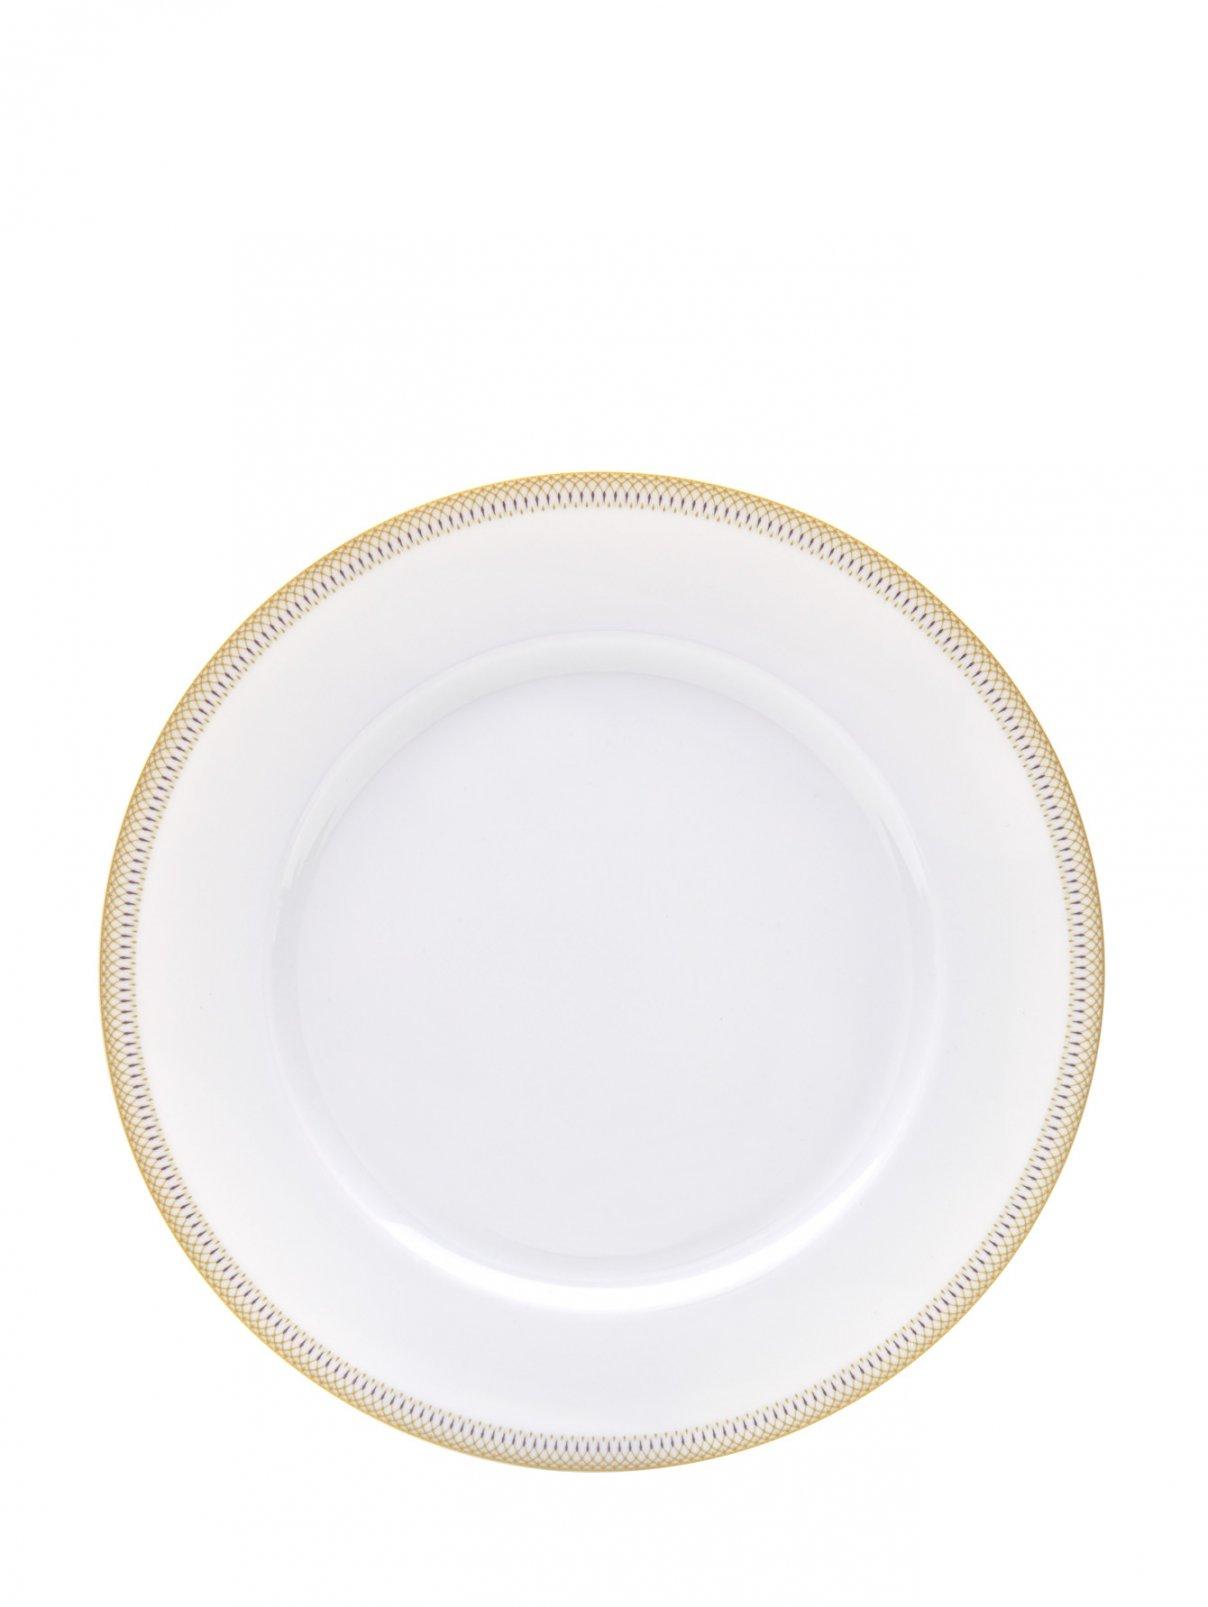 Тарелка обеденная, диаметр - 28 см Haviland  –  Общий вид